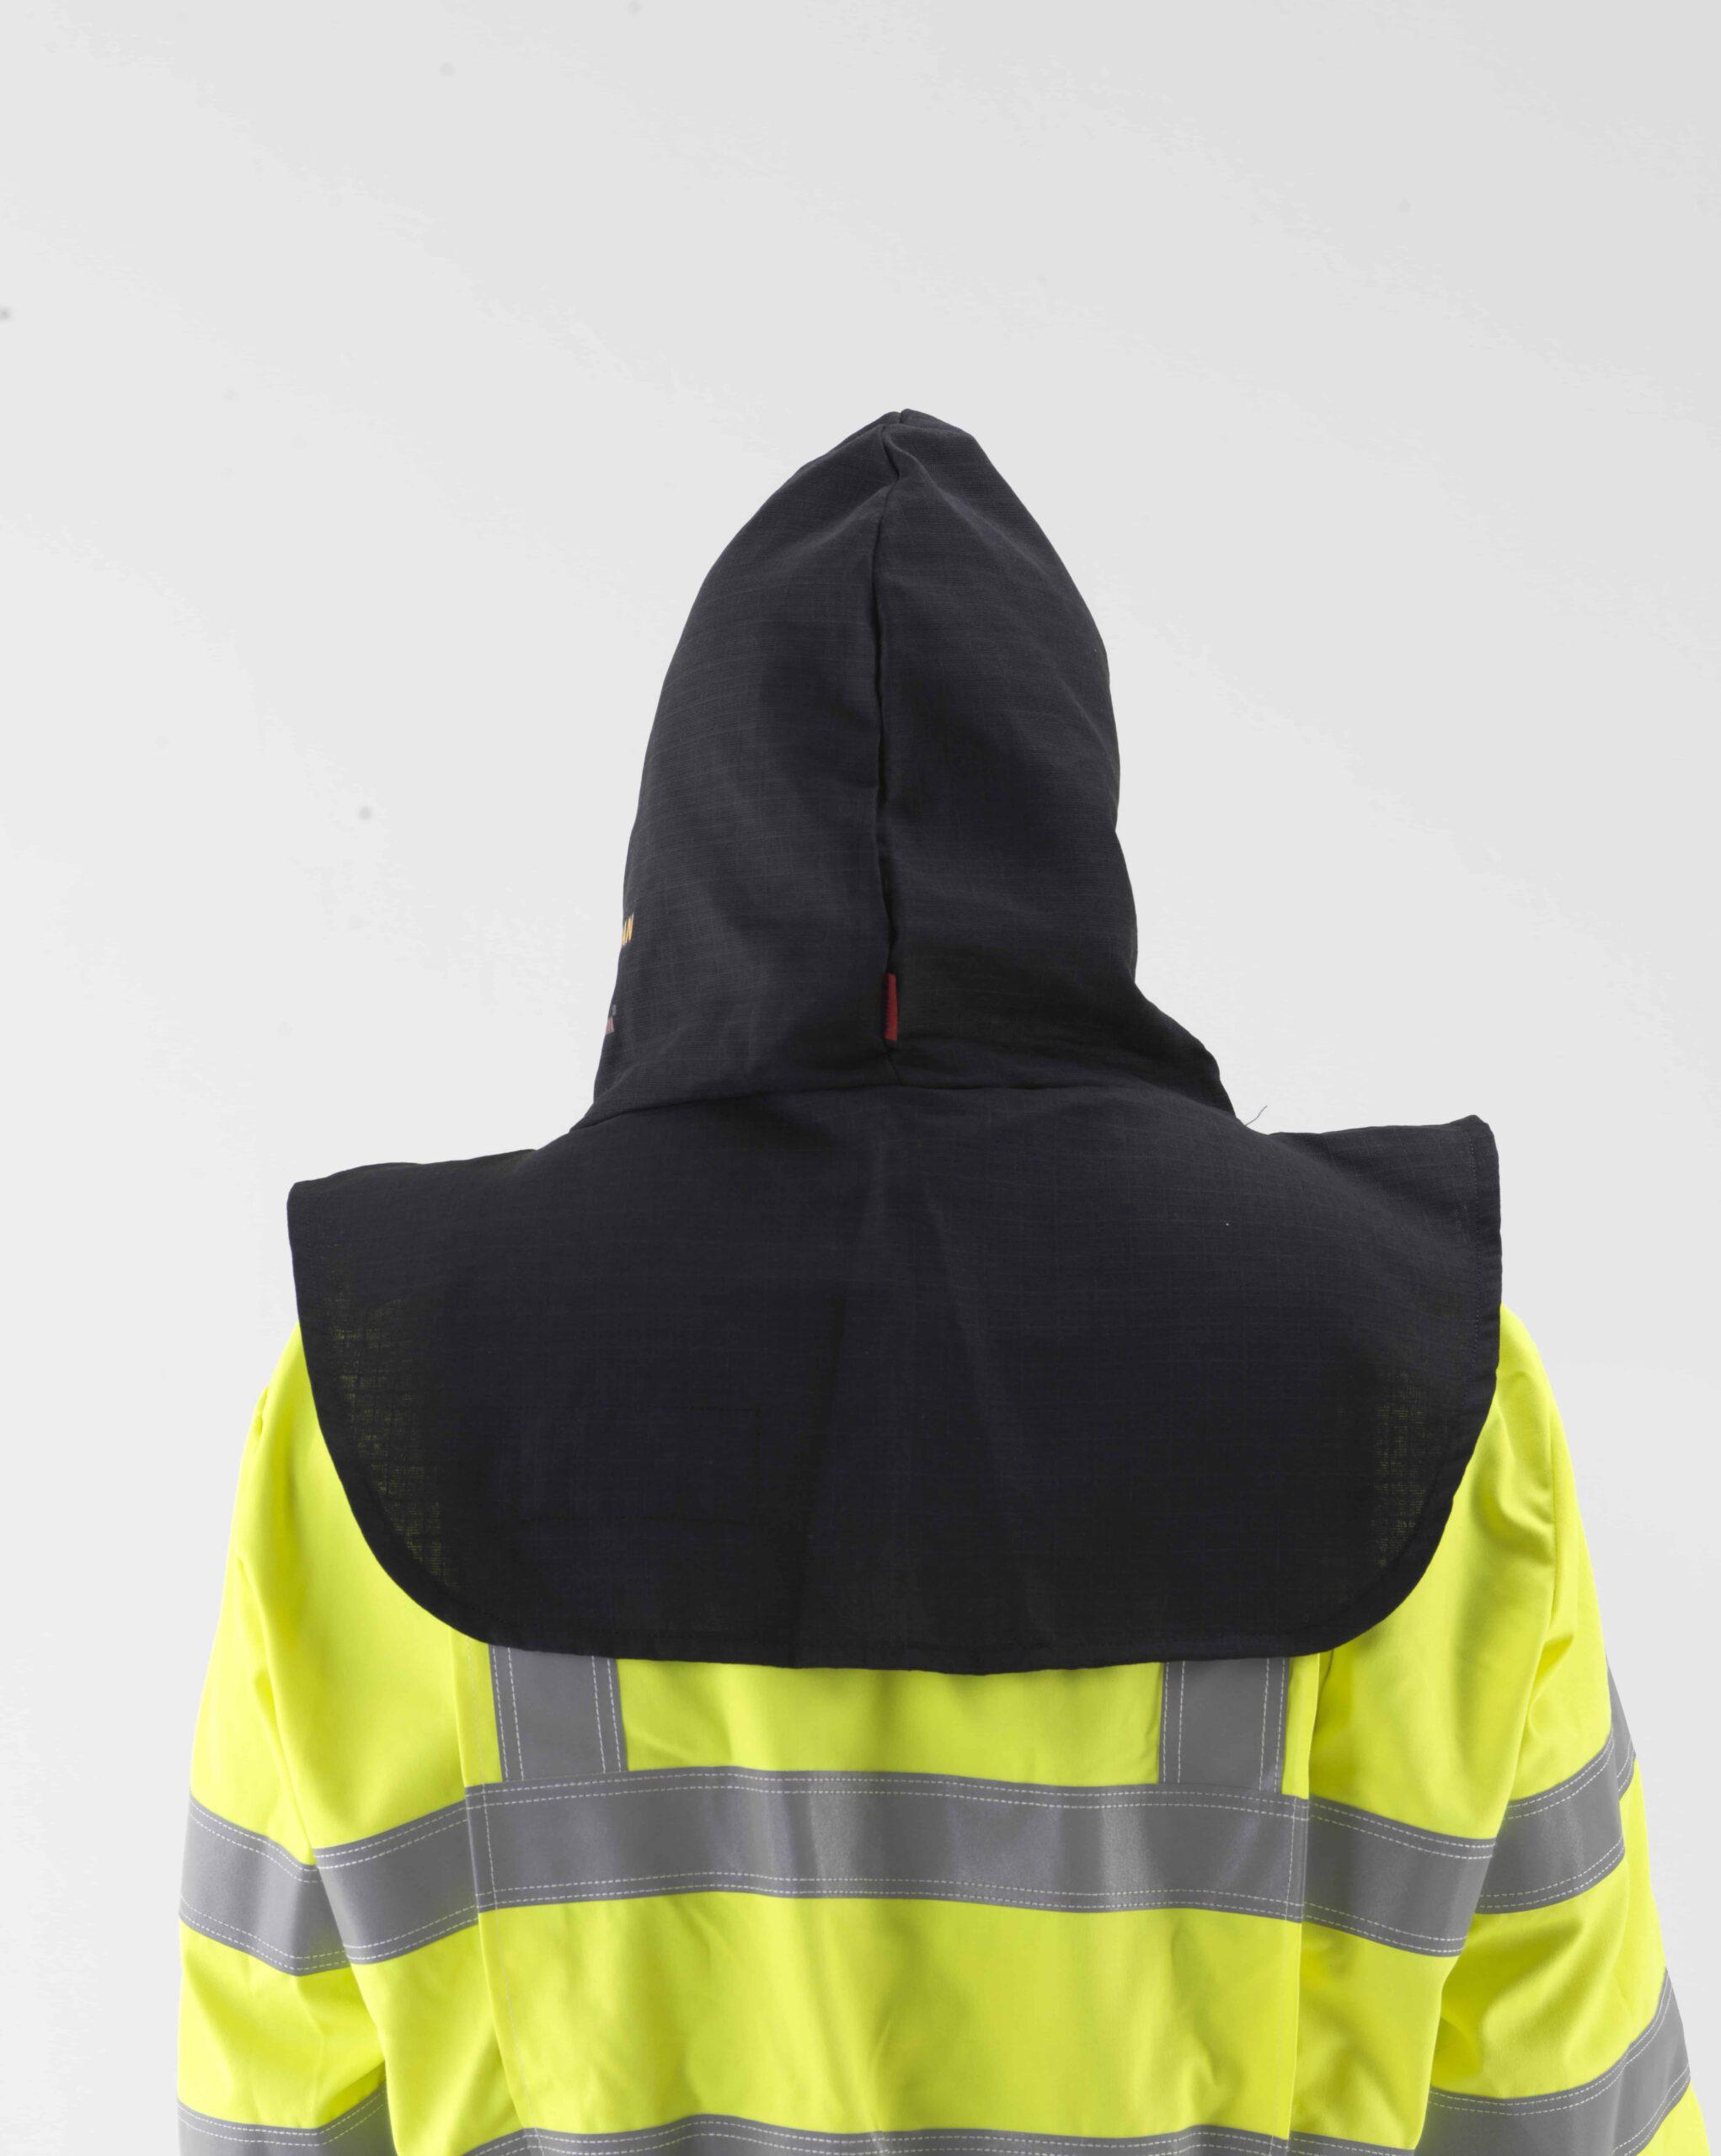 Arc flash protection balaclava hood back